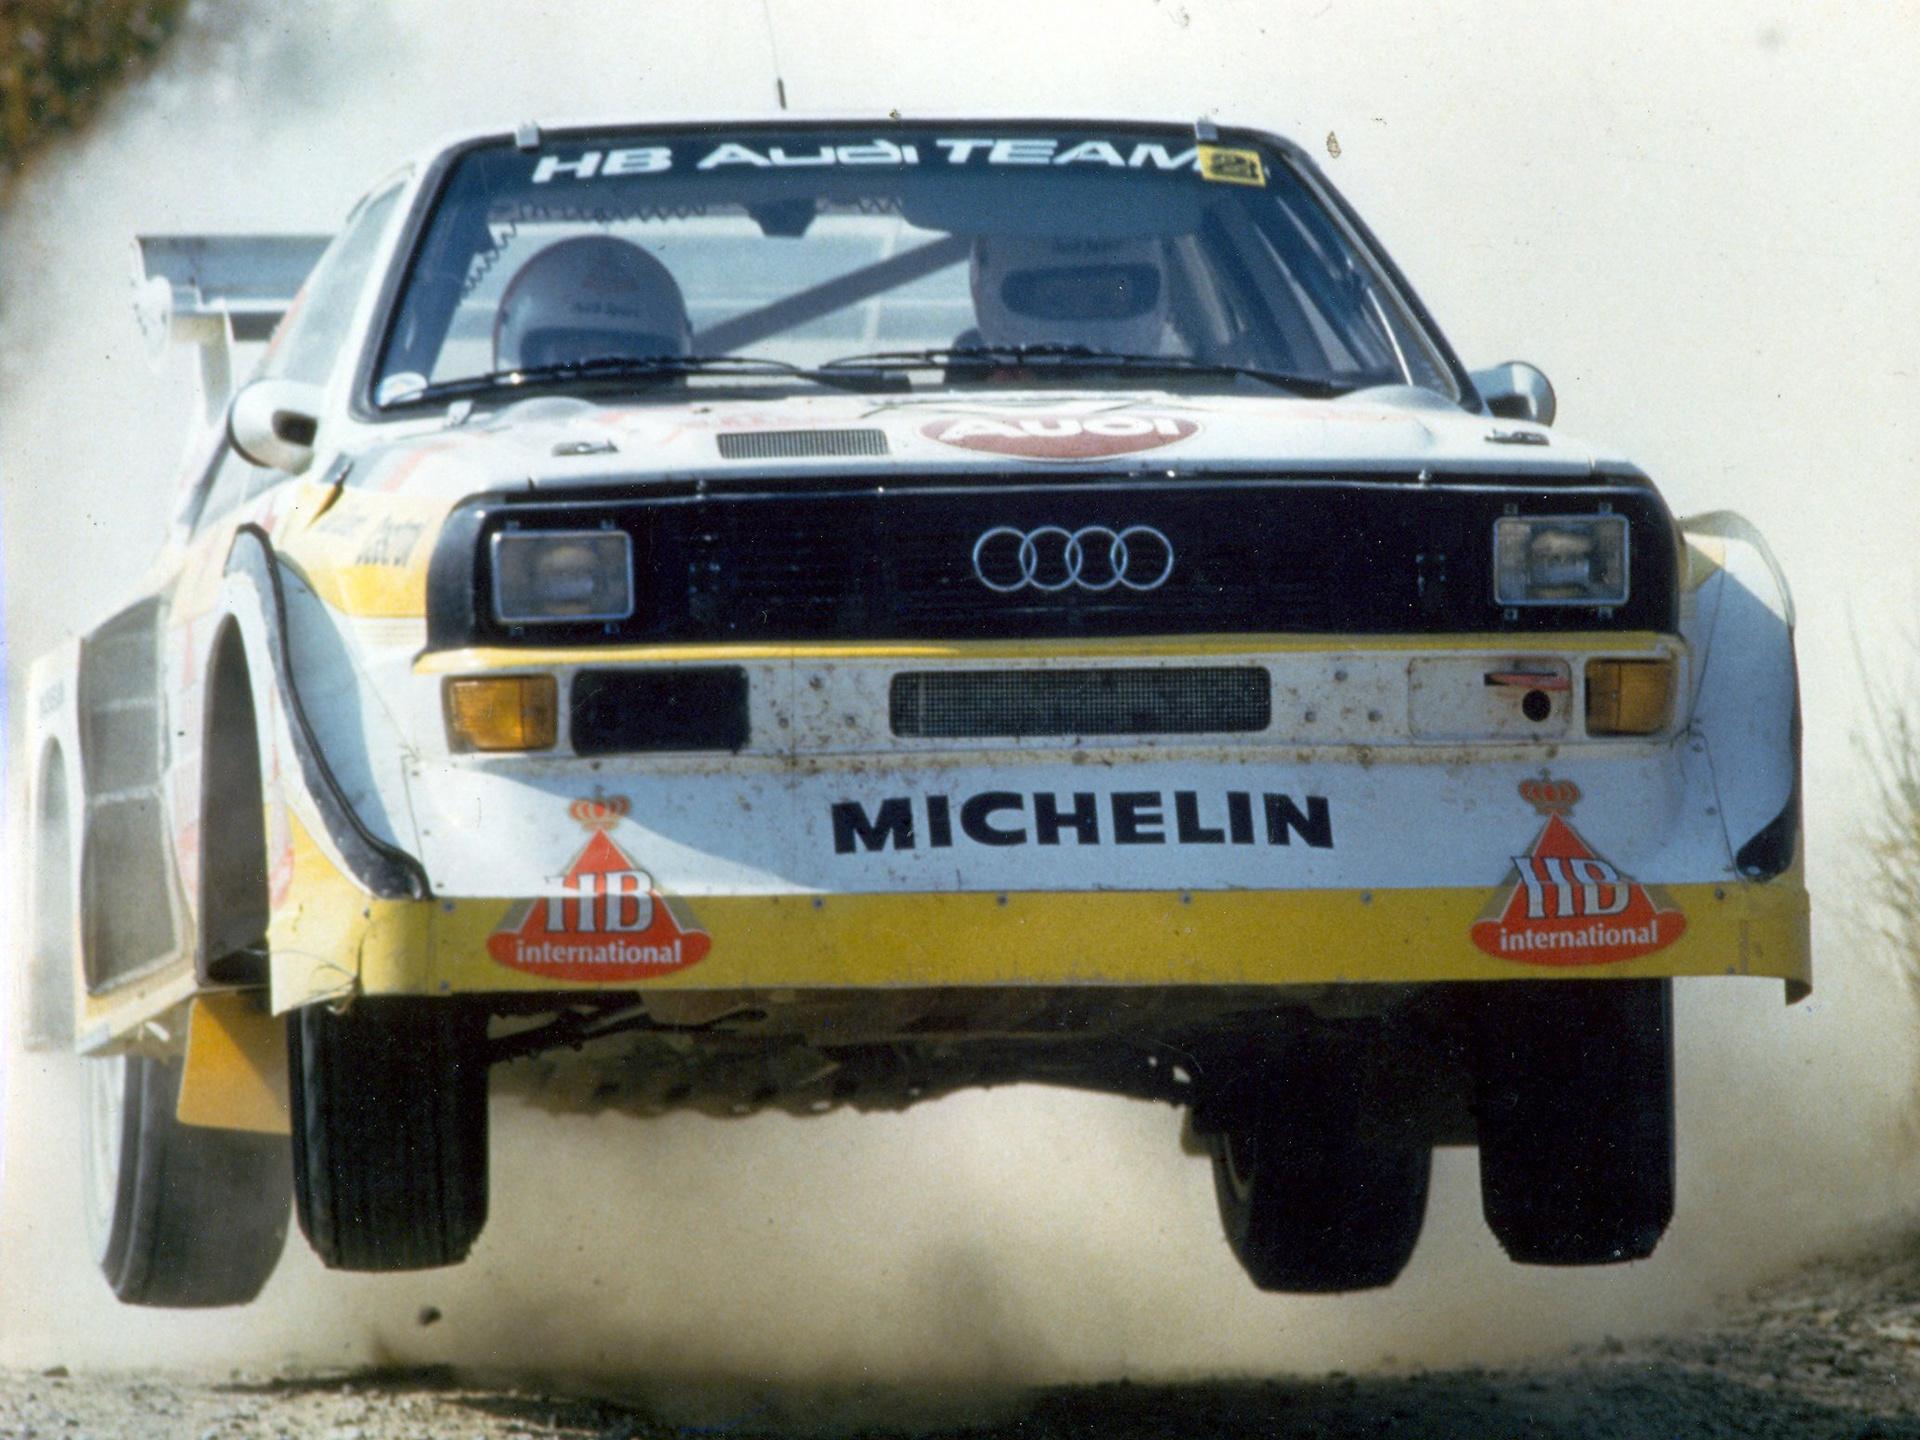 Sport quattro S 1 Group B Rally race racing g wallpaper background 1920x1440